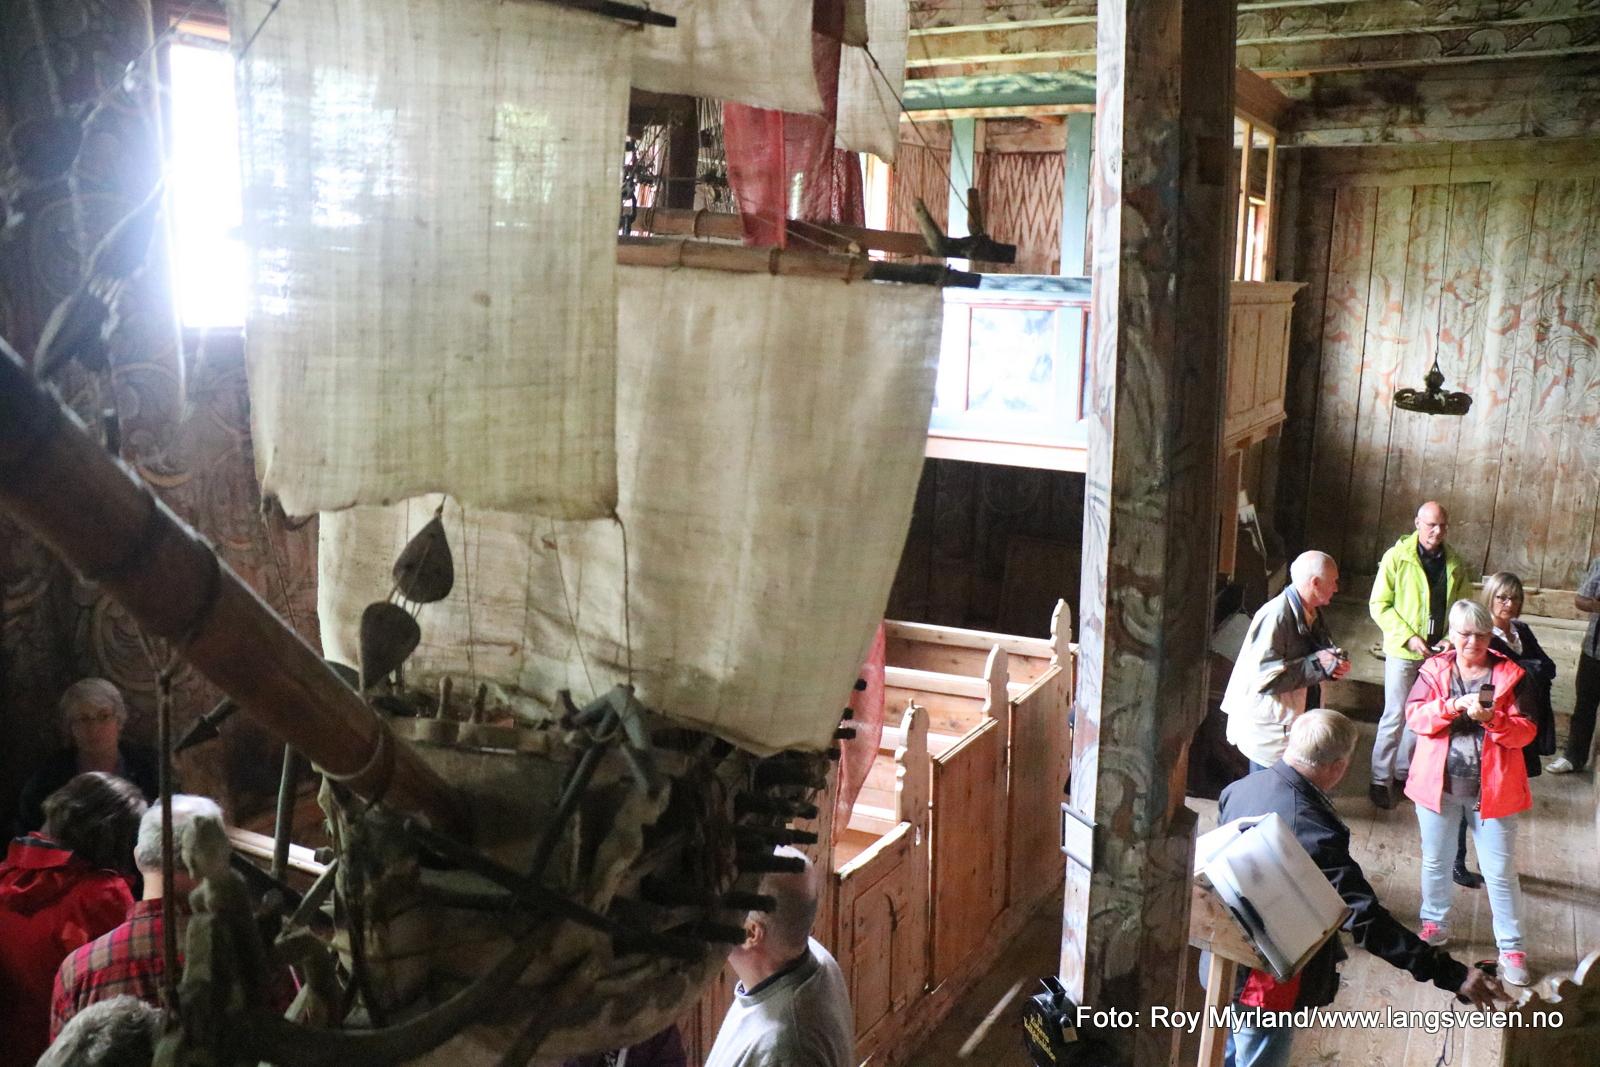 Dynekilslaget minatyr nordstjernen fregatt foto roy myrland